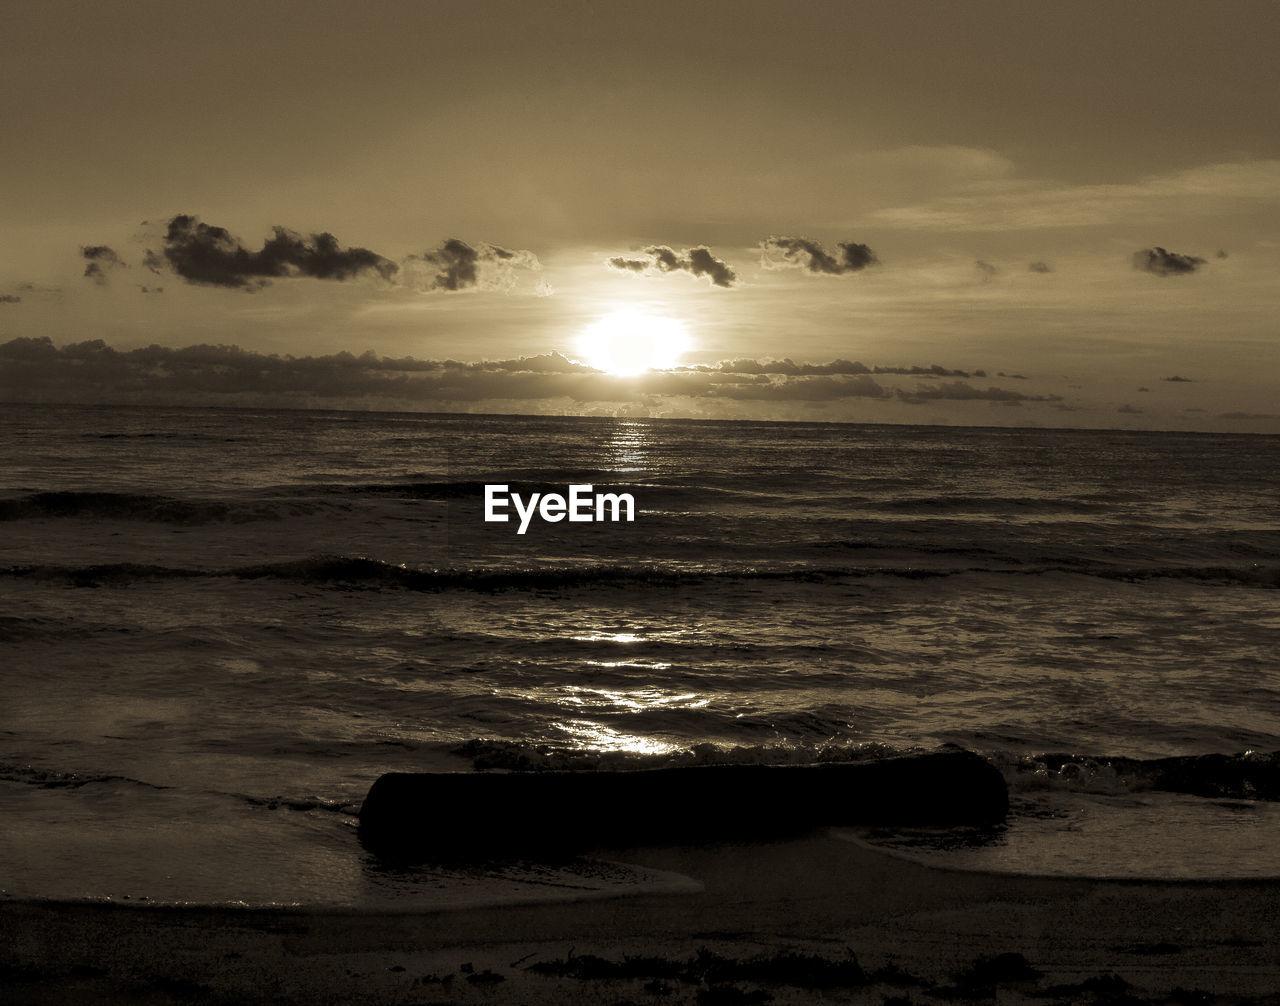 sea, sky, water, scenics - nature, sunset, beauty in nature, horizon over water, beach, land, horizon, cloud - sky, tranquil scene, tranquility, nature, no people, sun, idyllic, wave, sunlight, outdoors, bright